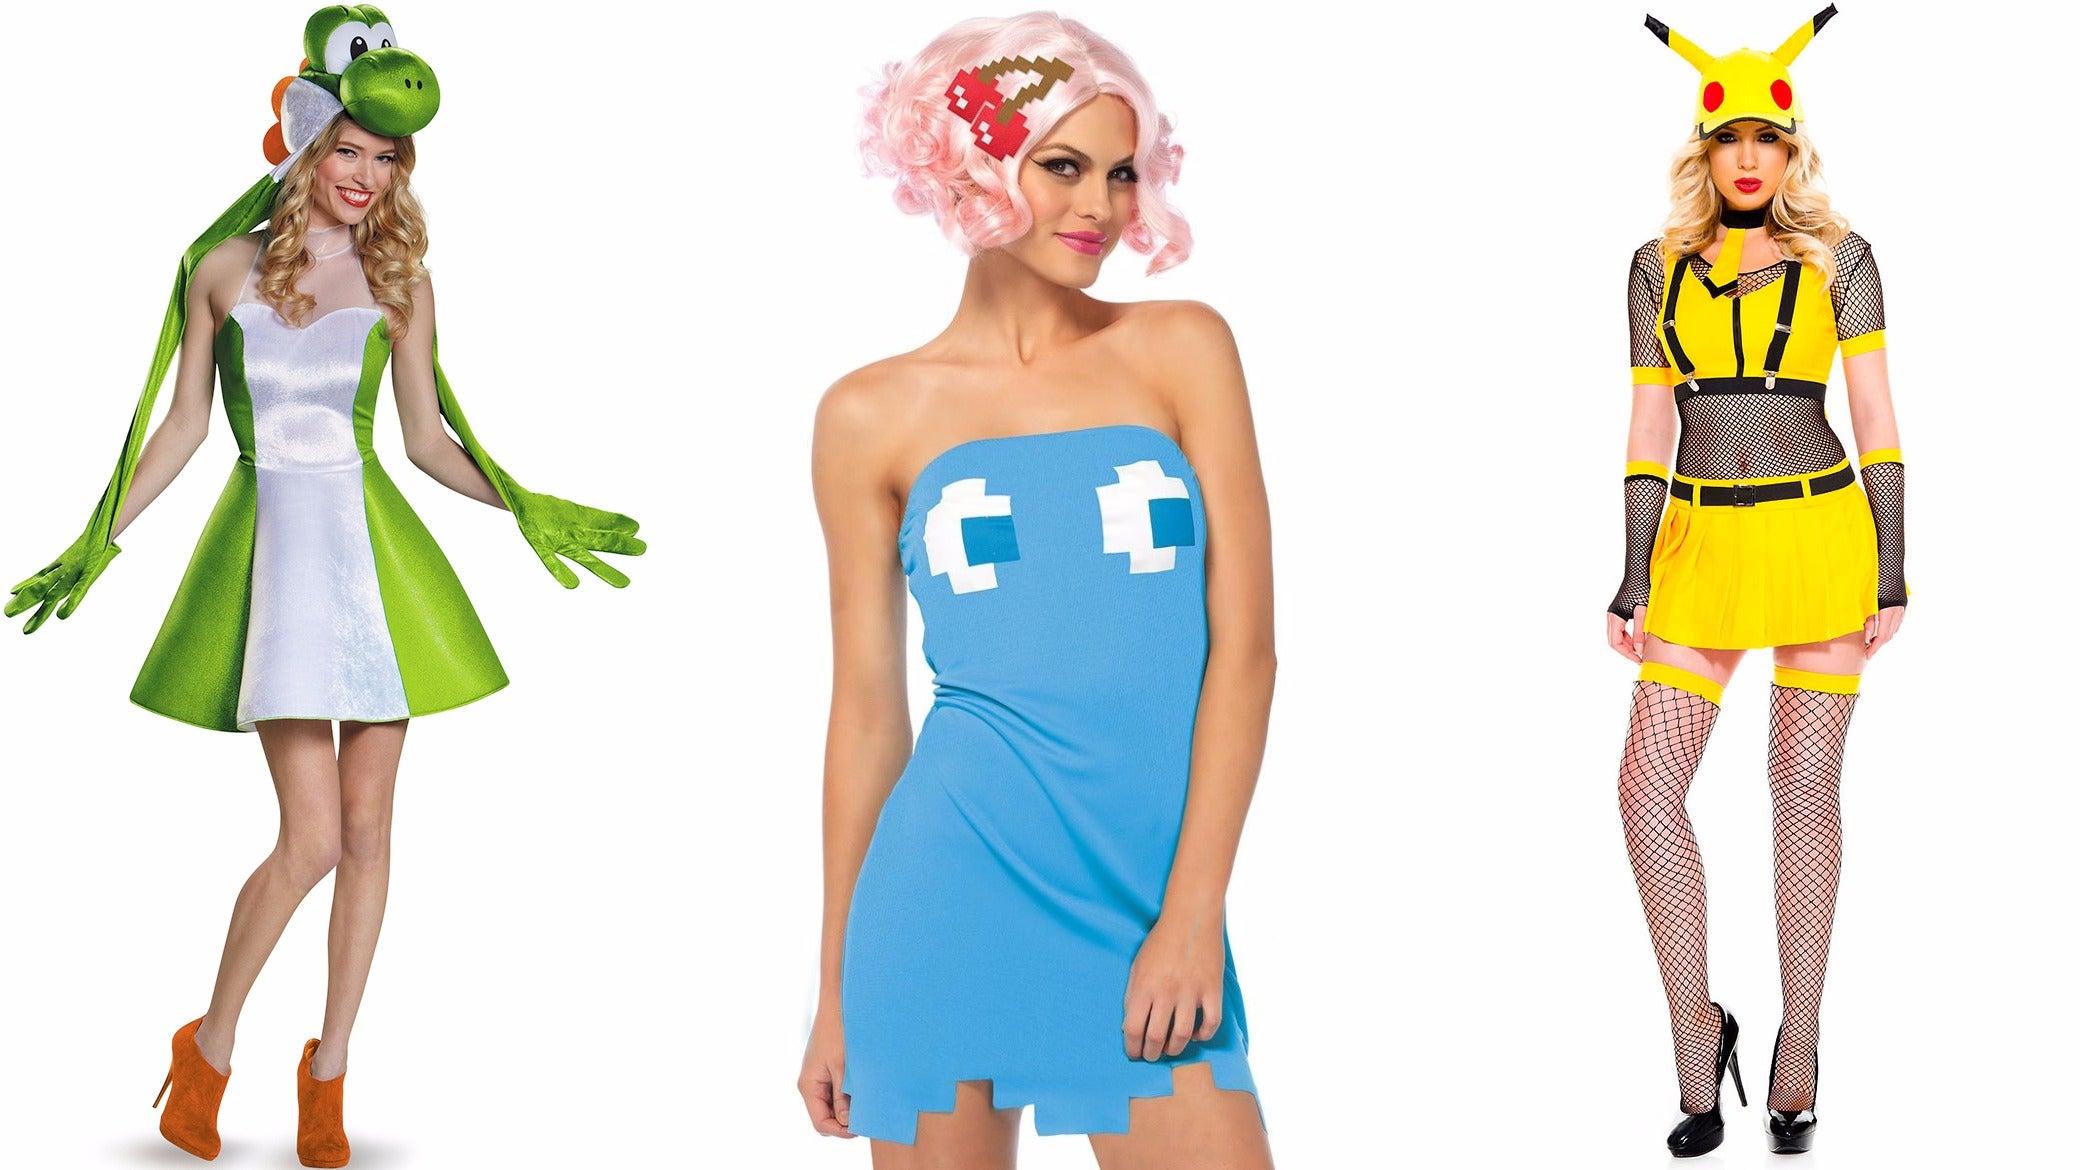 the most mind boggling  u0027sexy u0027 costumes of halloween 2017  rh   io9 gizmodo